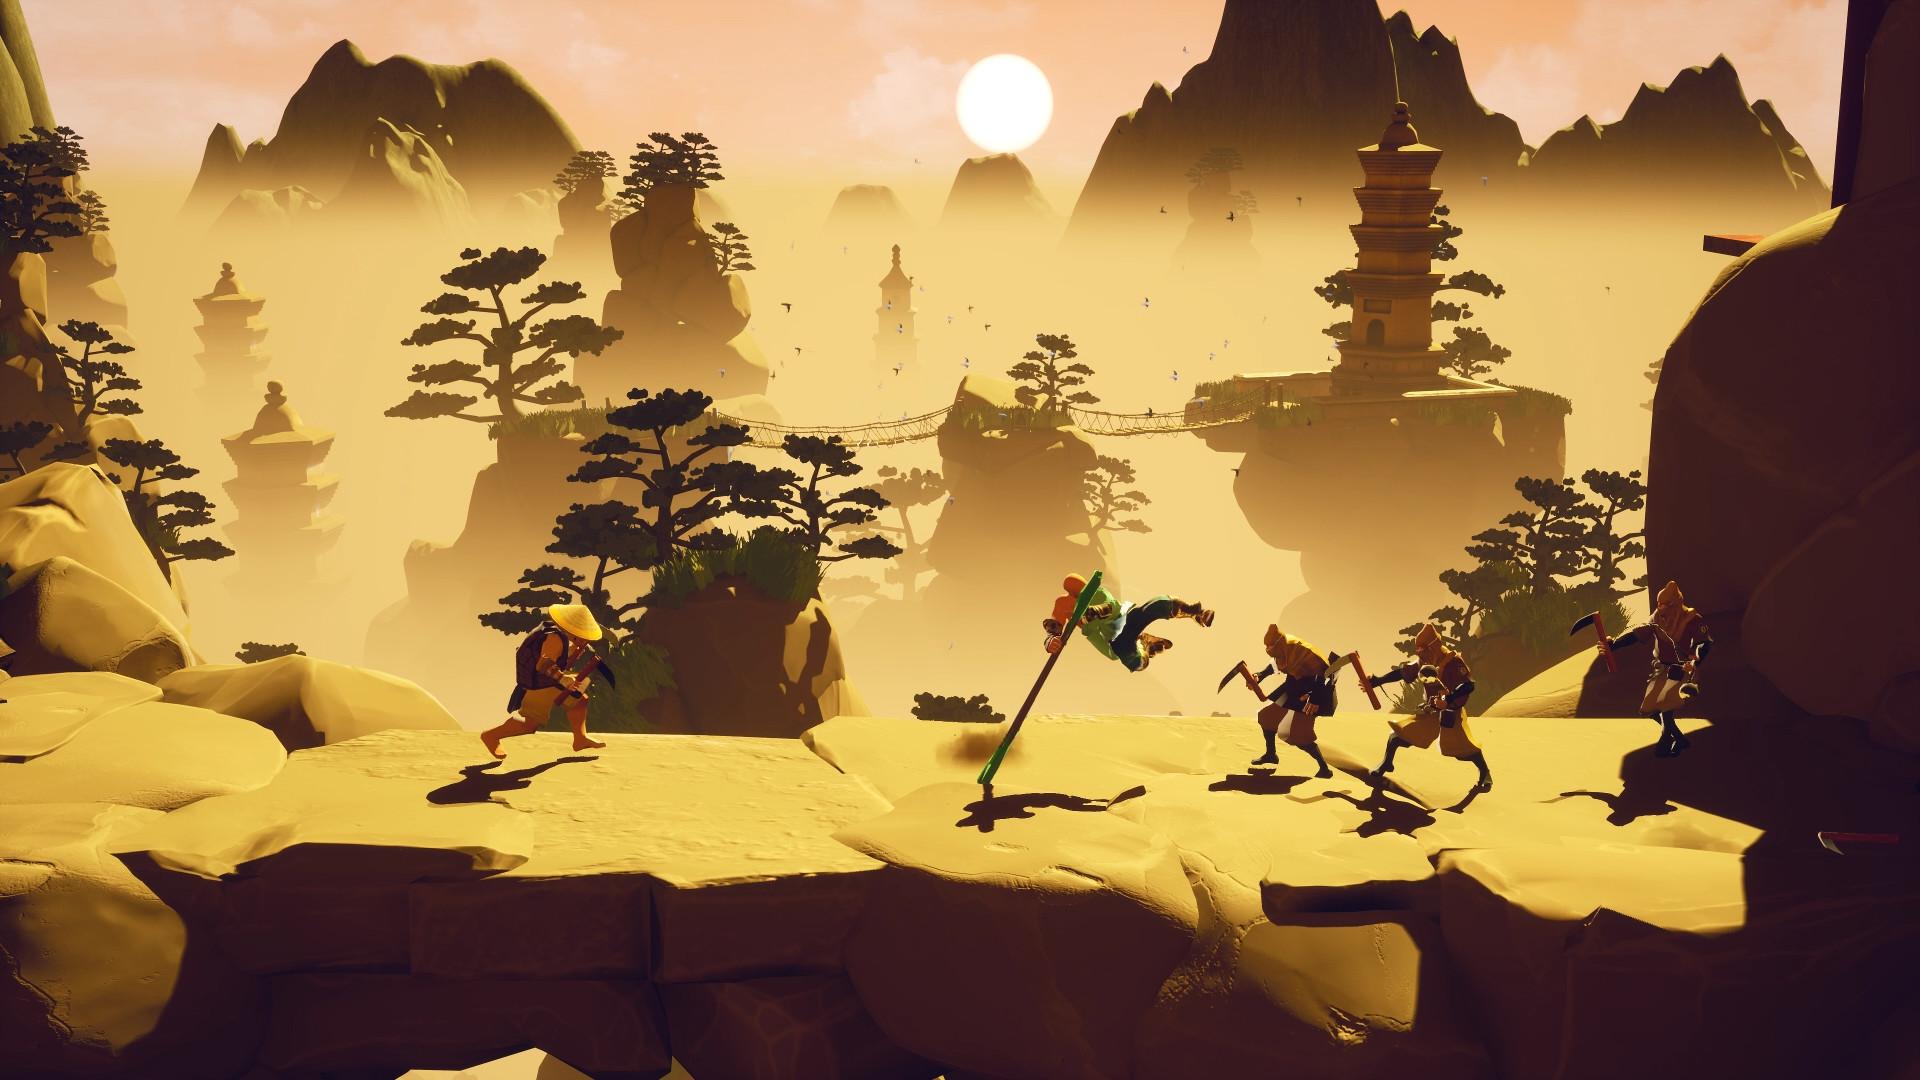 9-monkeys-of-shaolin-pc-screenshot-01